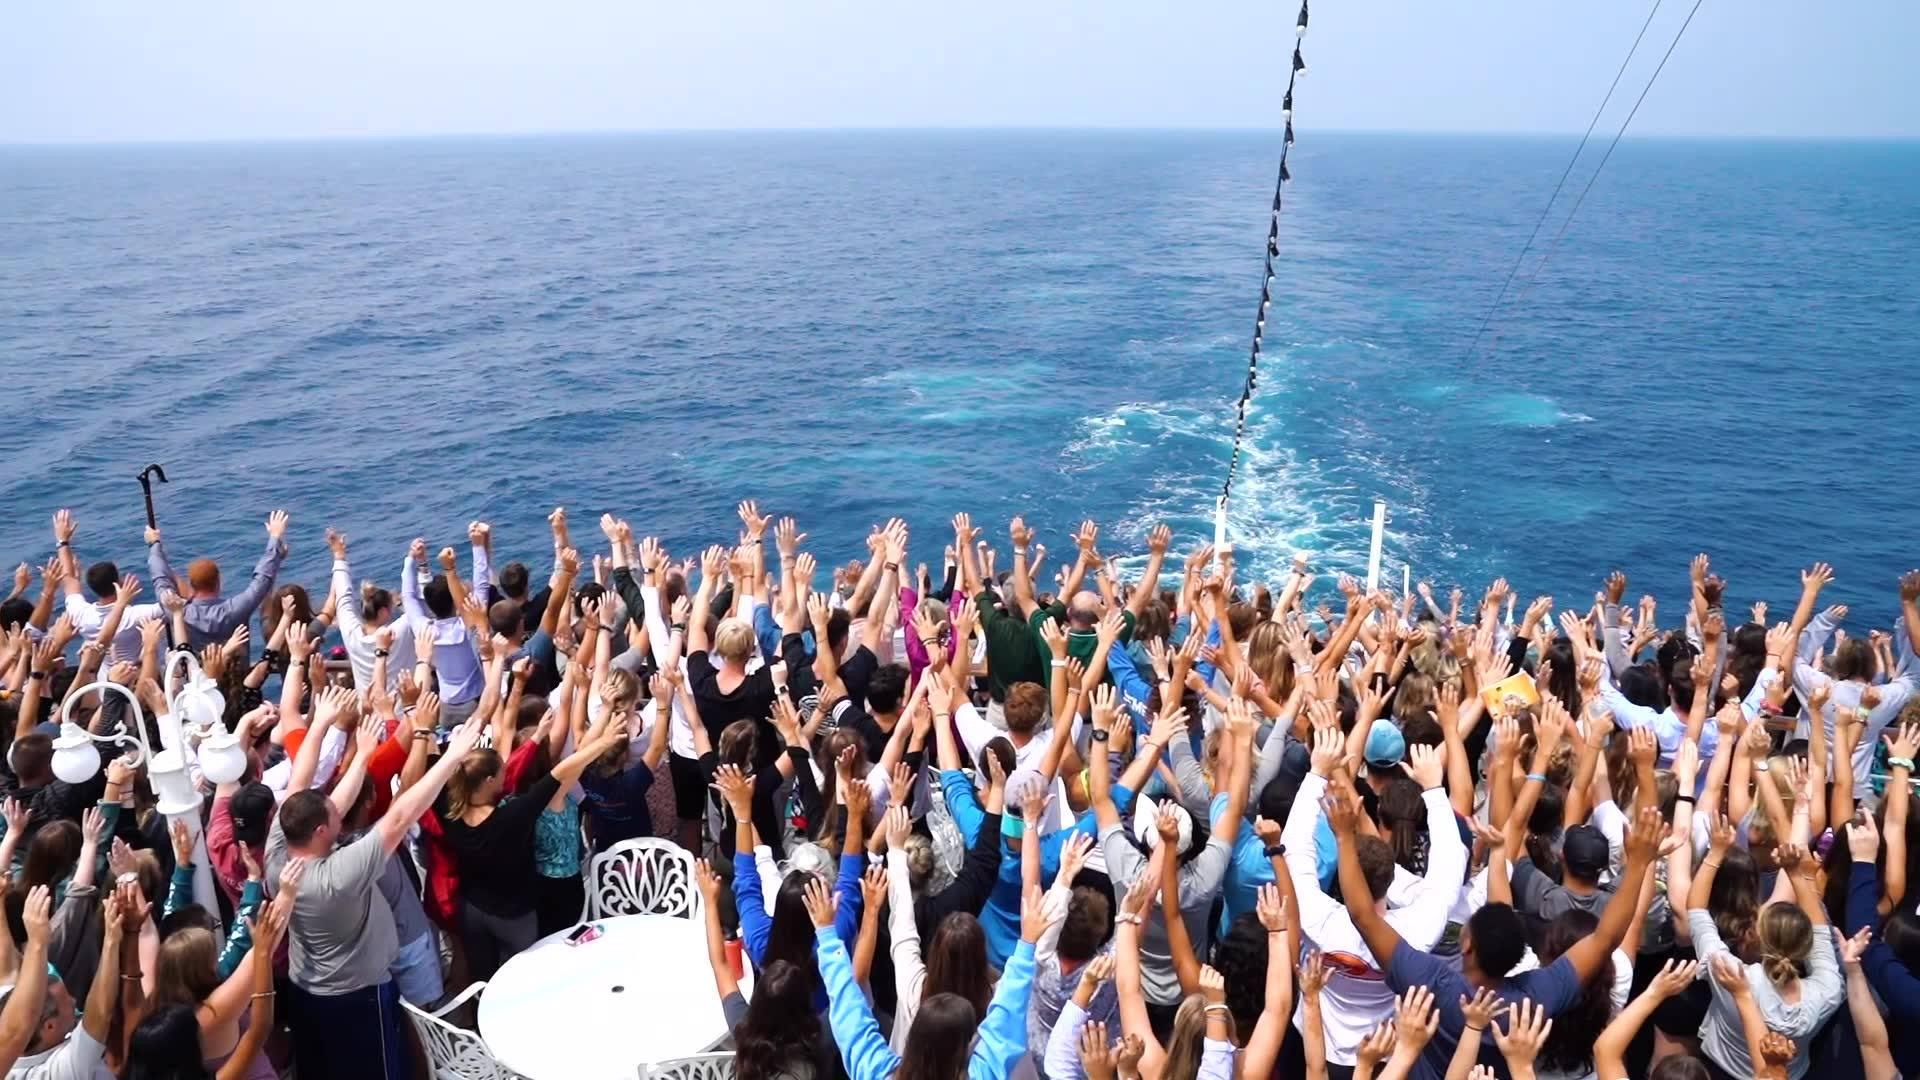 Voyage Recap: Semester at Sea's Fall 2018 Voyage